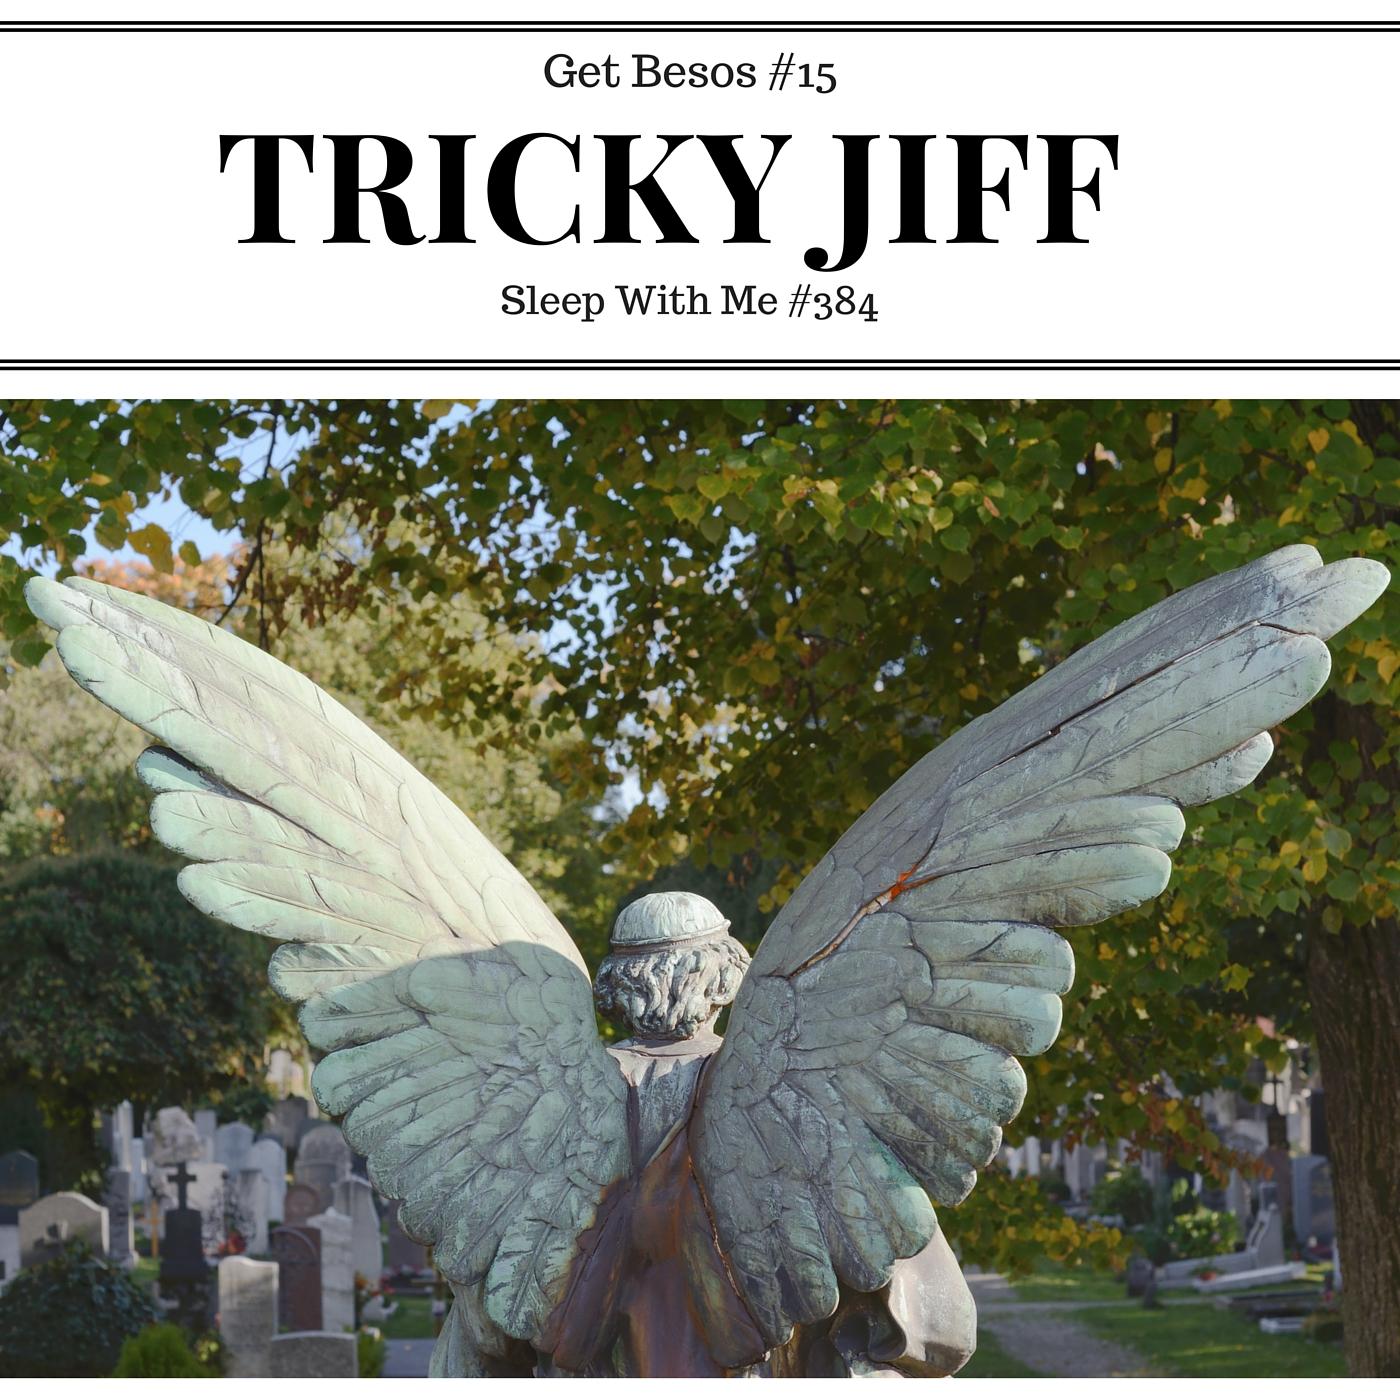 Tricky Jiff | Get Besos #15 | Sleep With Me #384